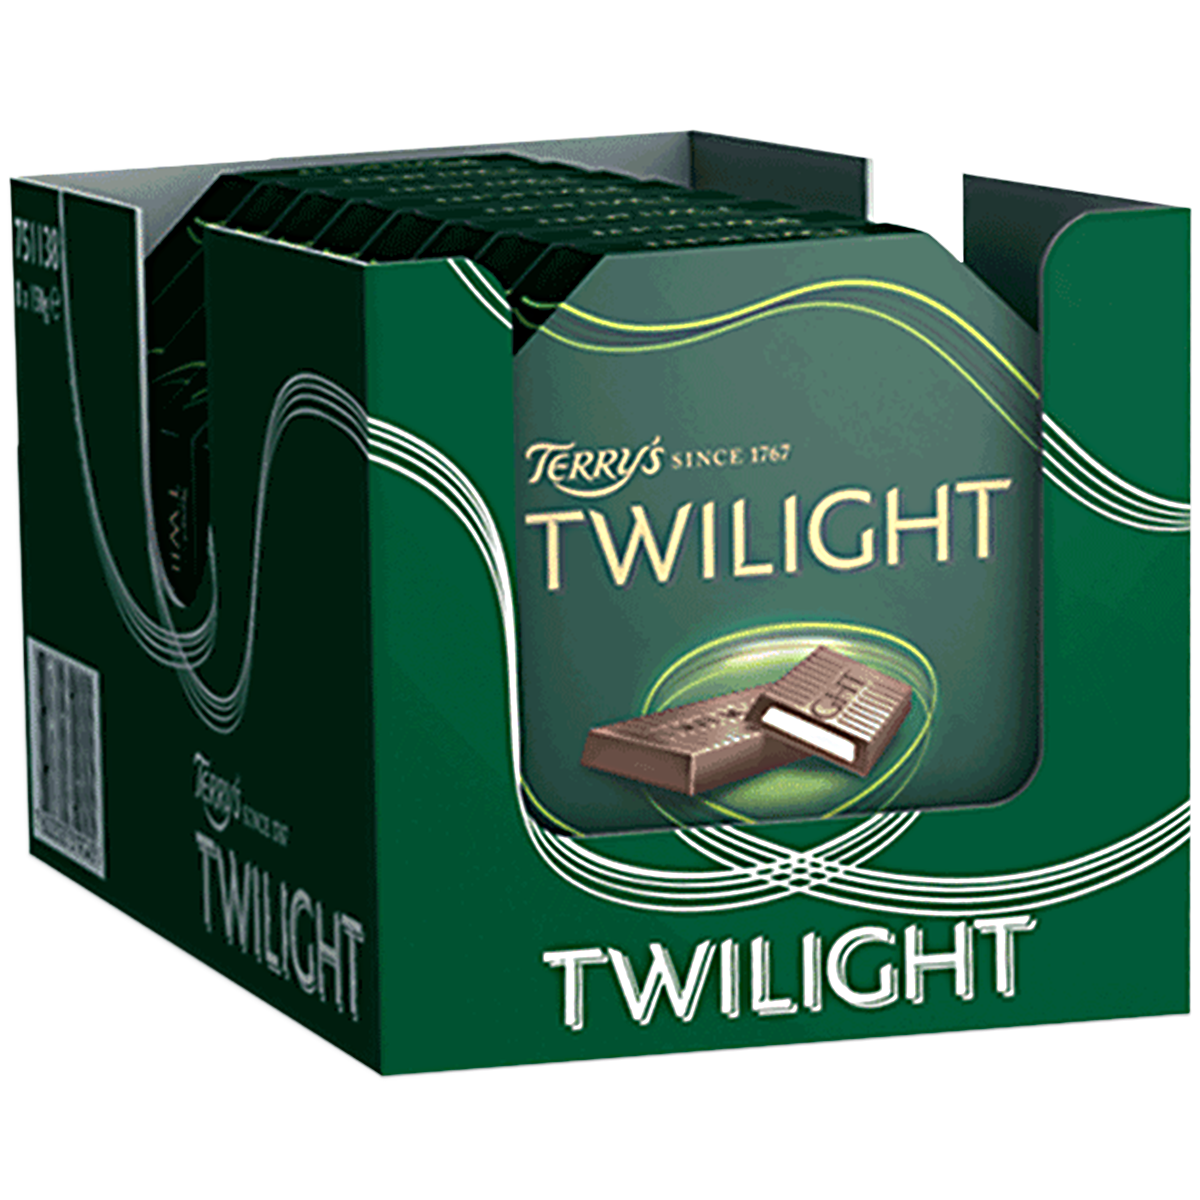 Chocolates Terry's Twilight Mints 150g (Box of 8)